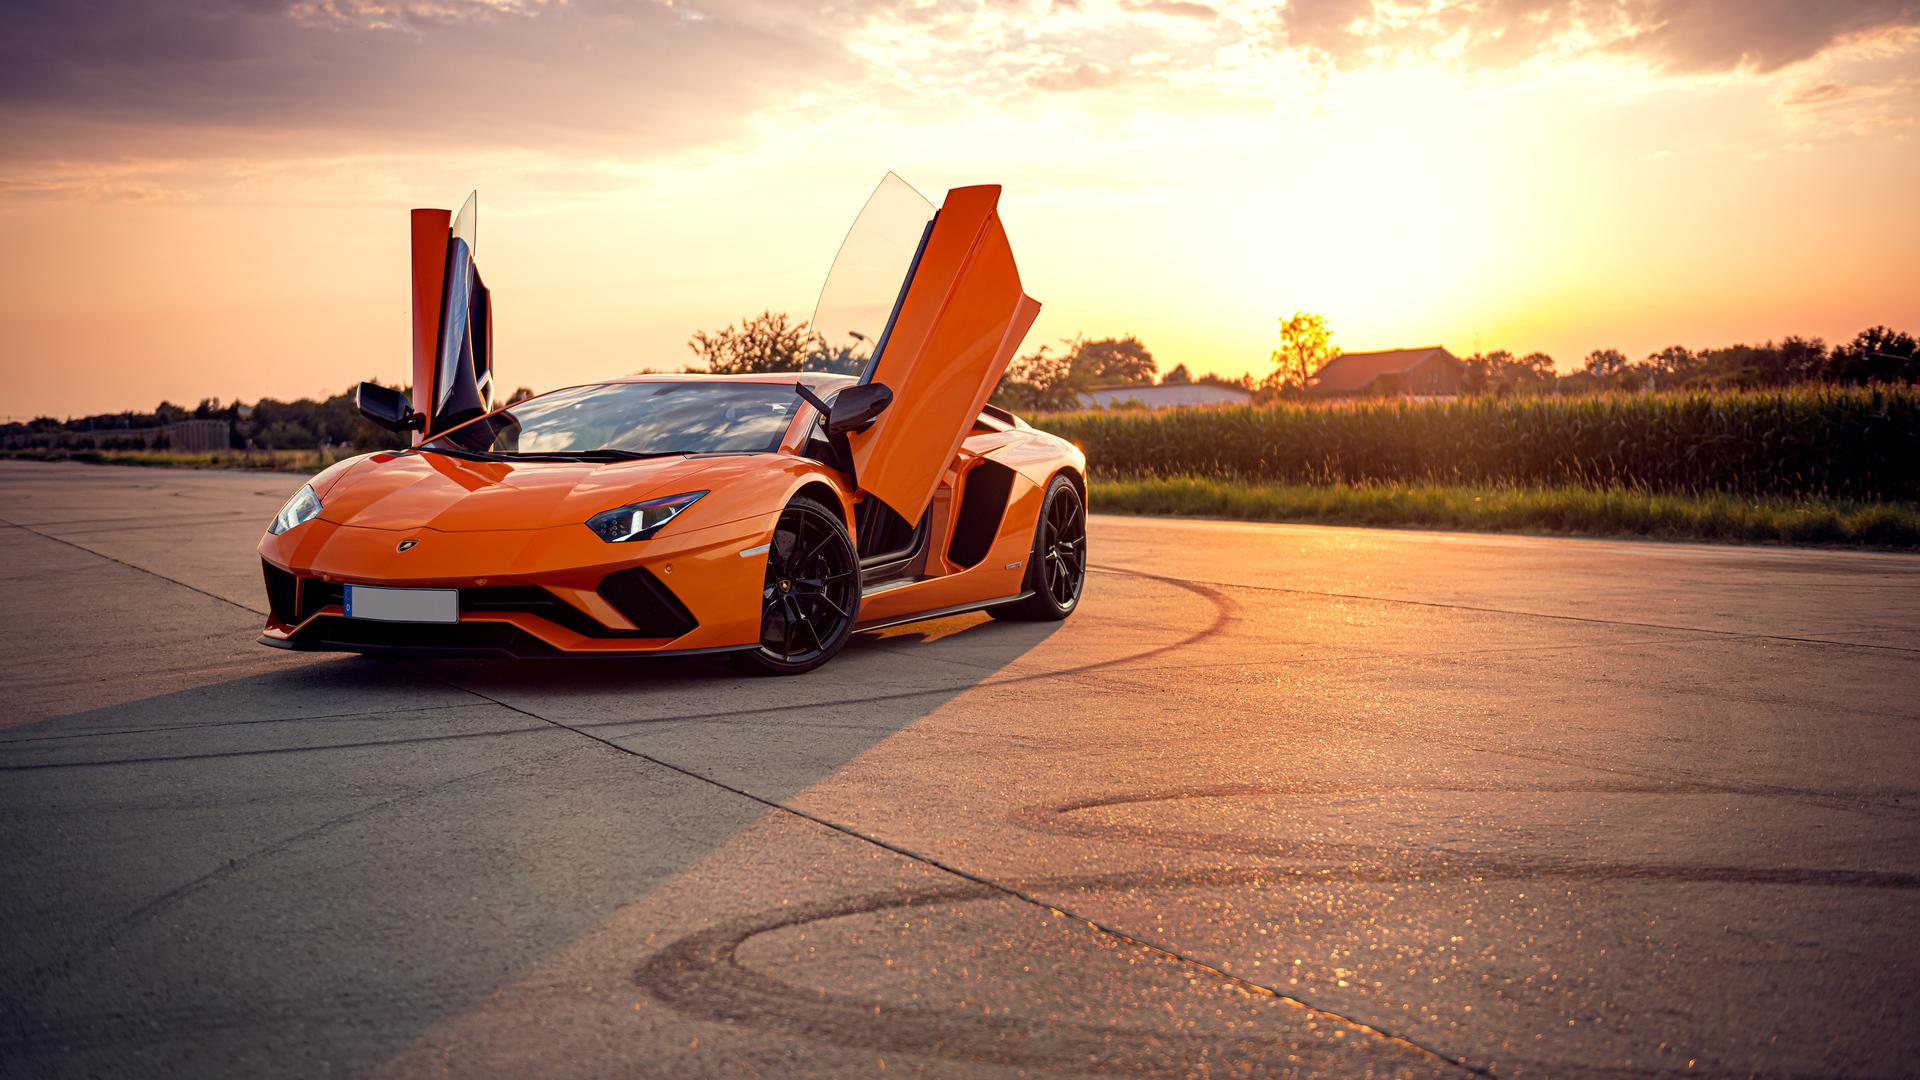 1920x1080 Orange Lamborghini Aventador 4k Laptop Full HD ...